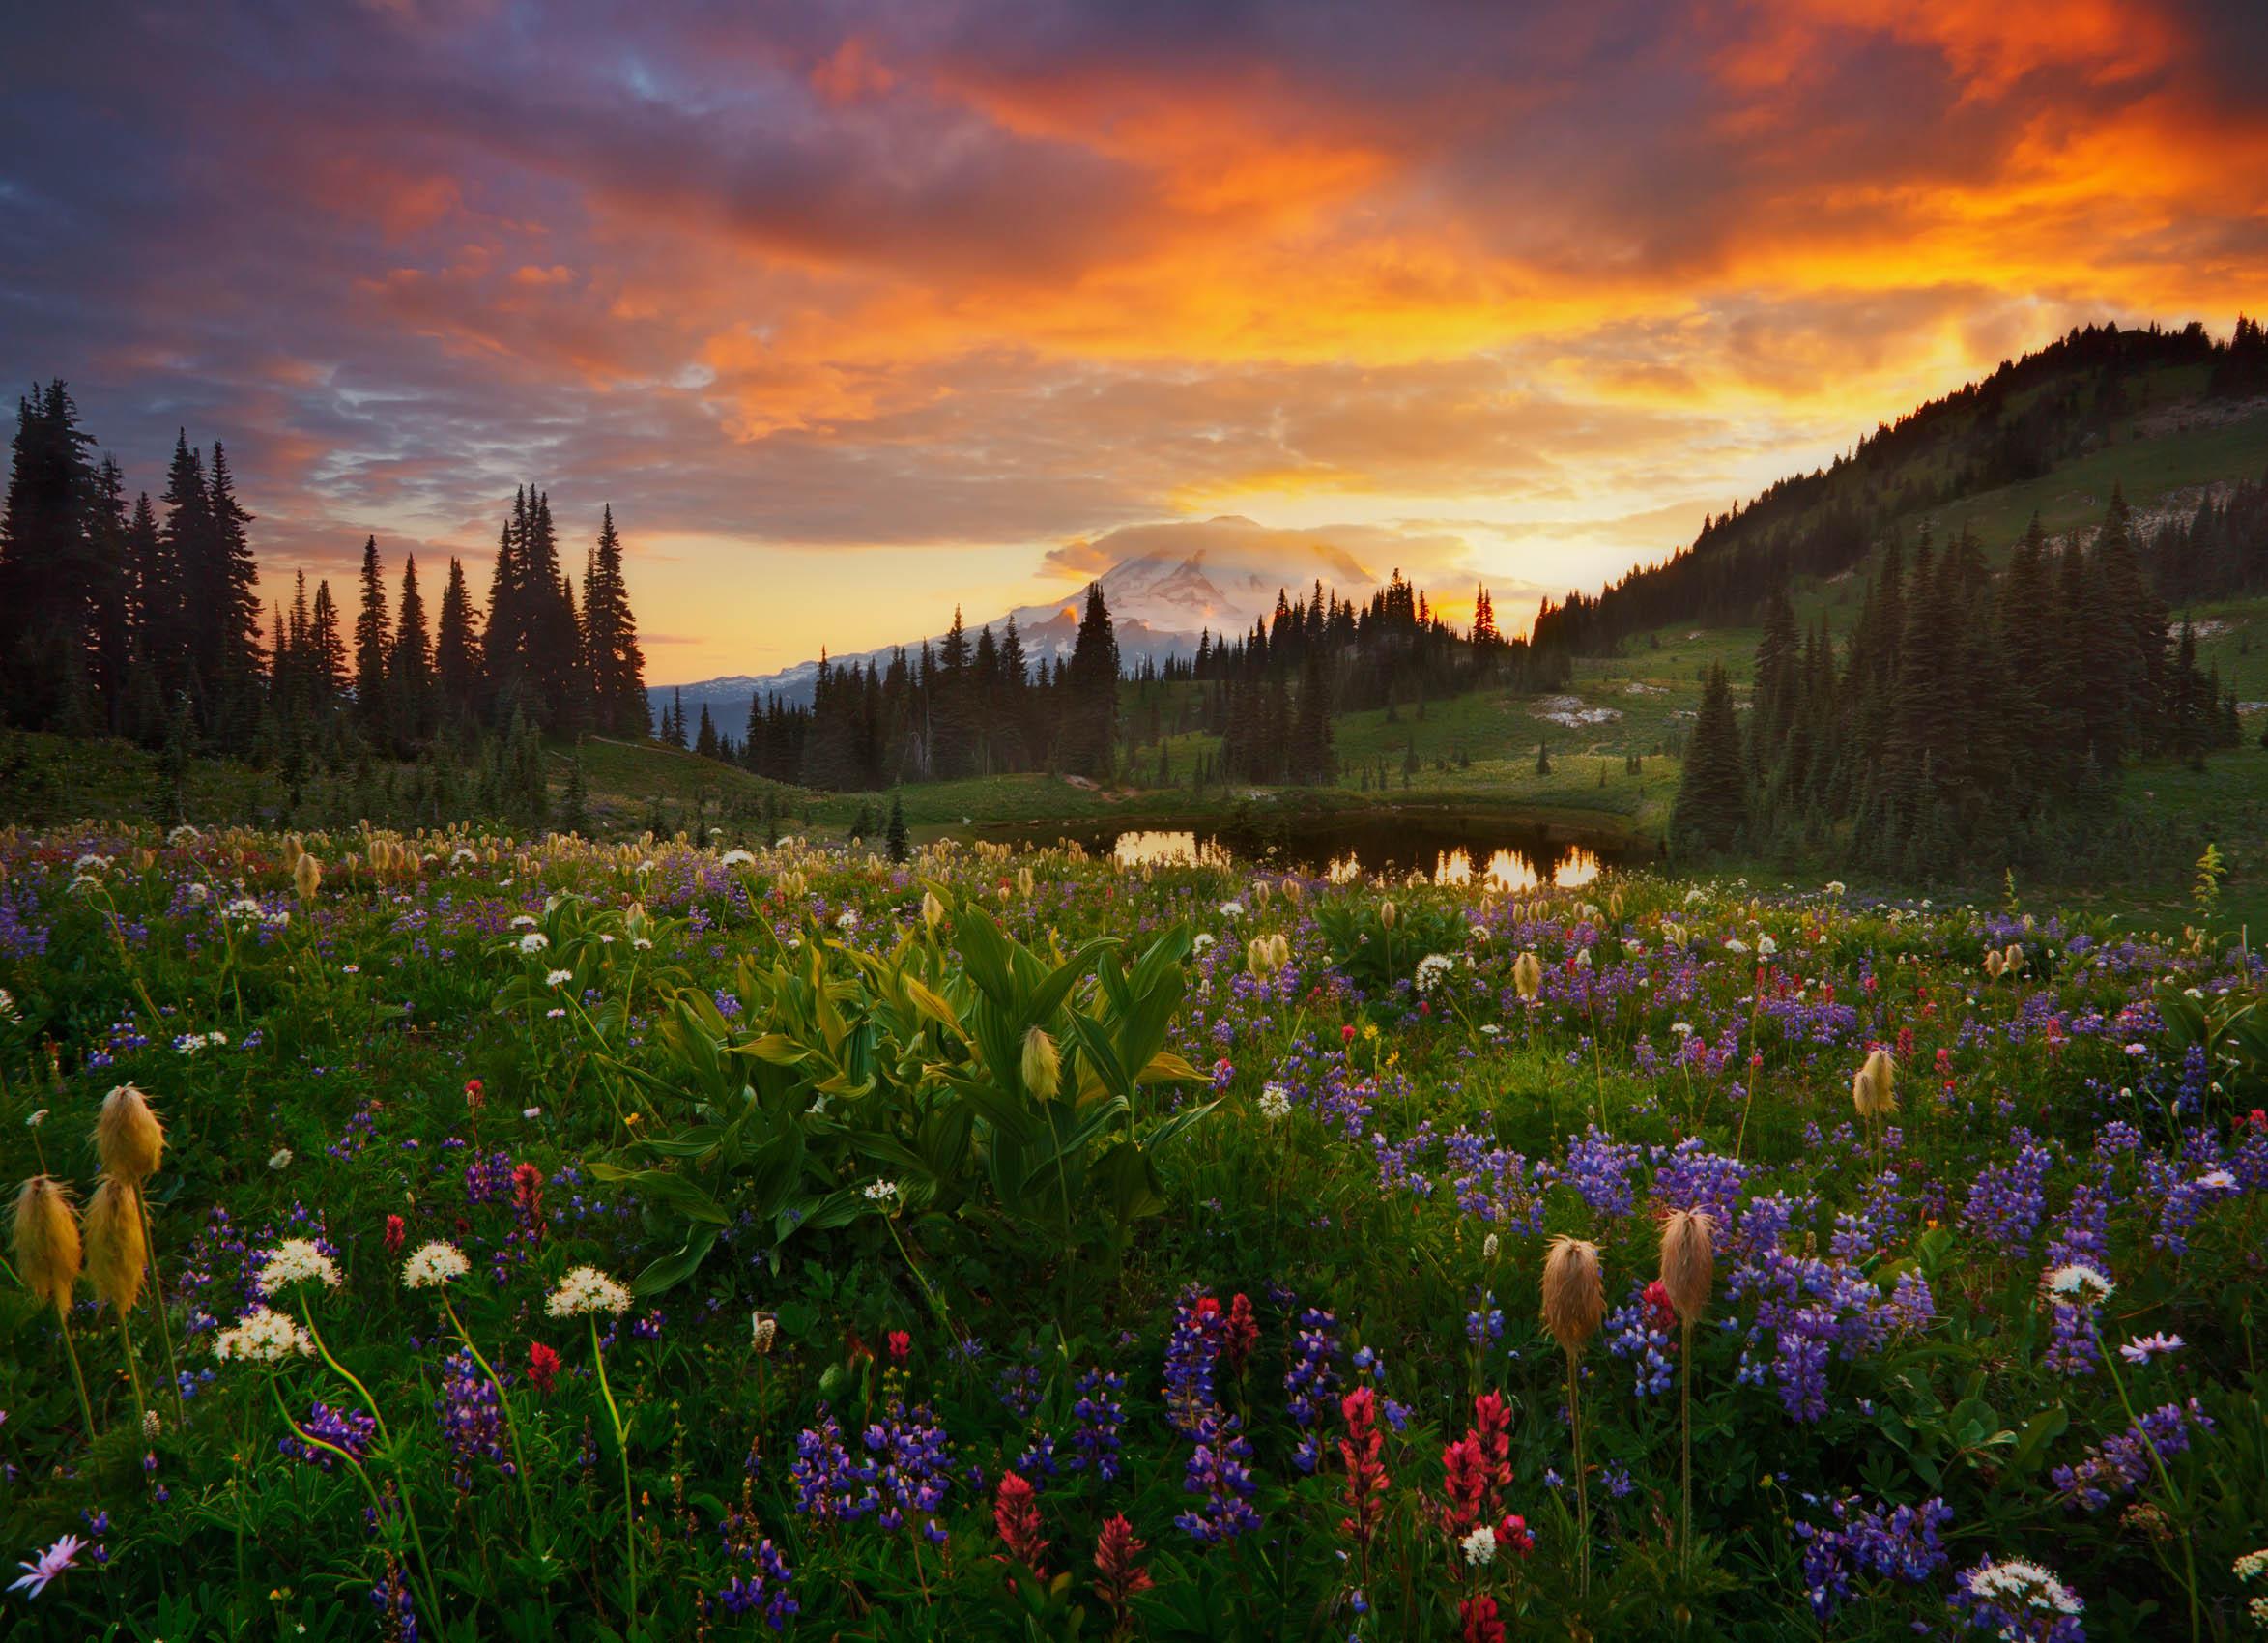 Wildflowers, Wild Light